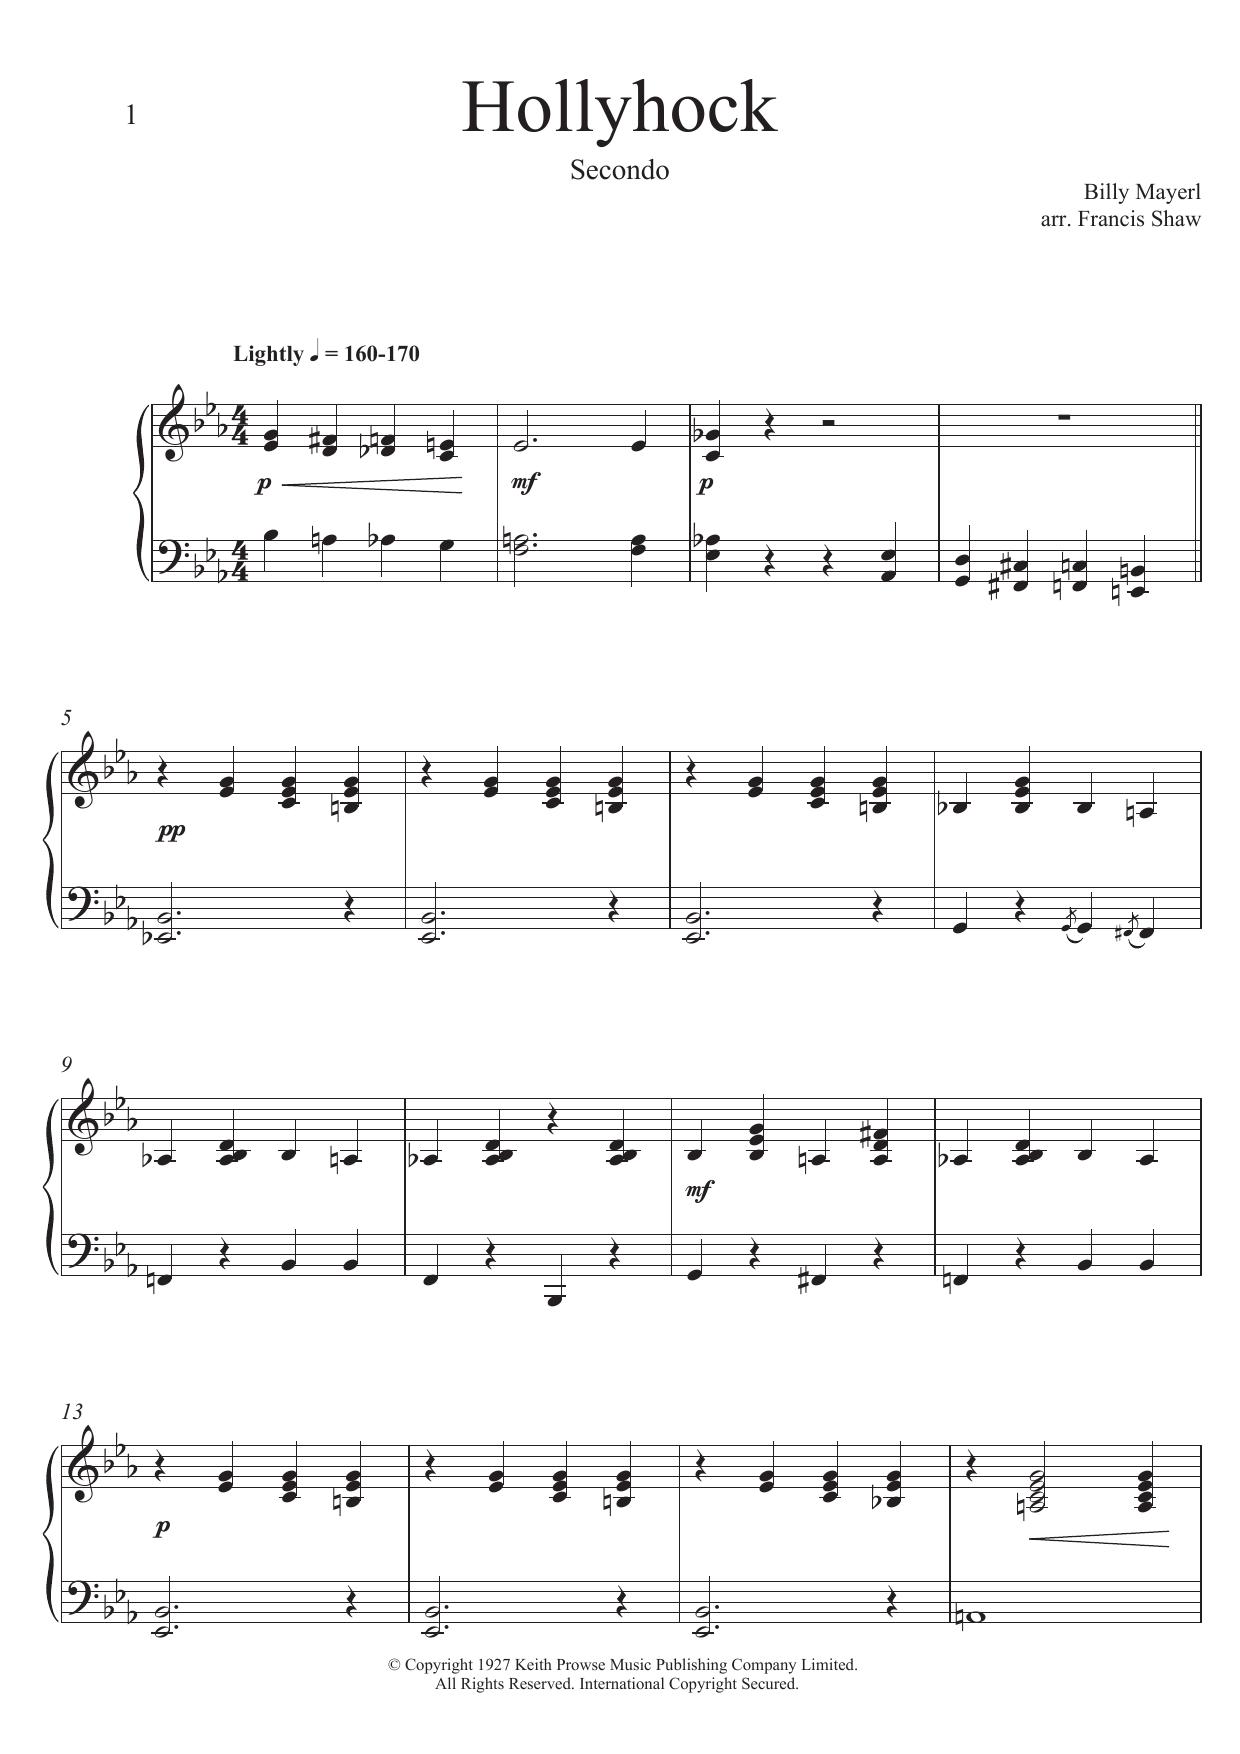 Hollyhock by Billy Mayerl Piano Duet Digital Sheet Music